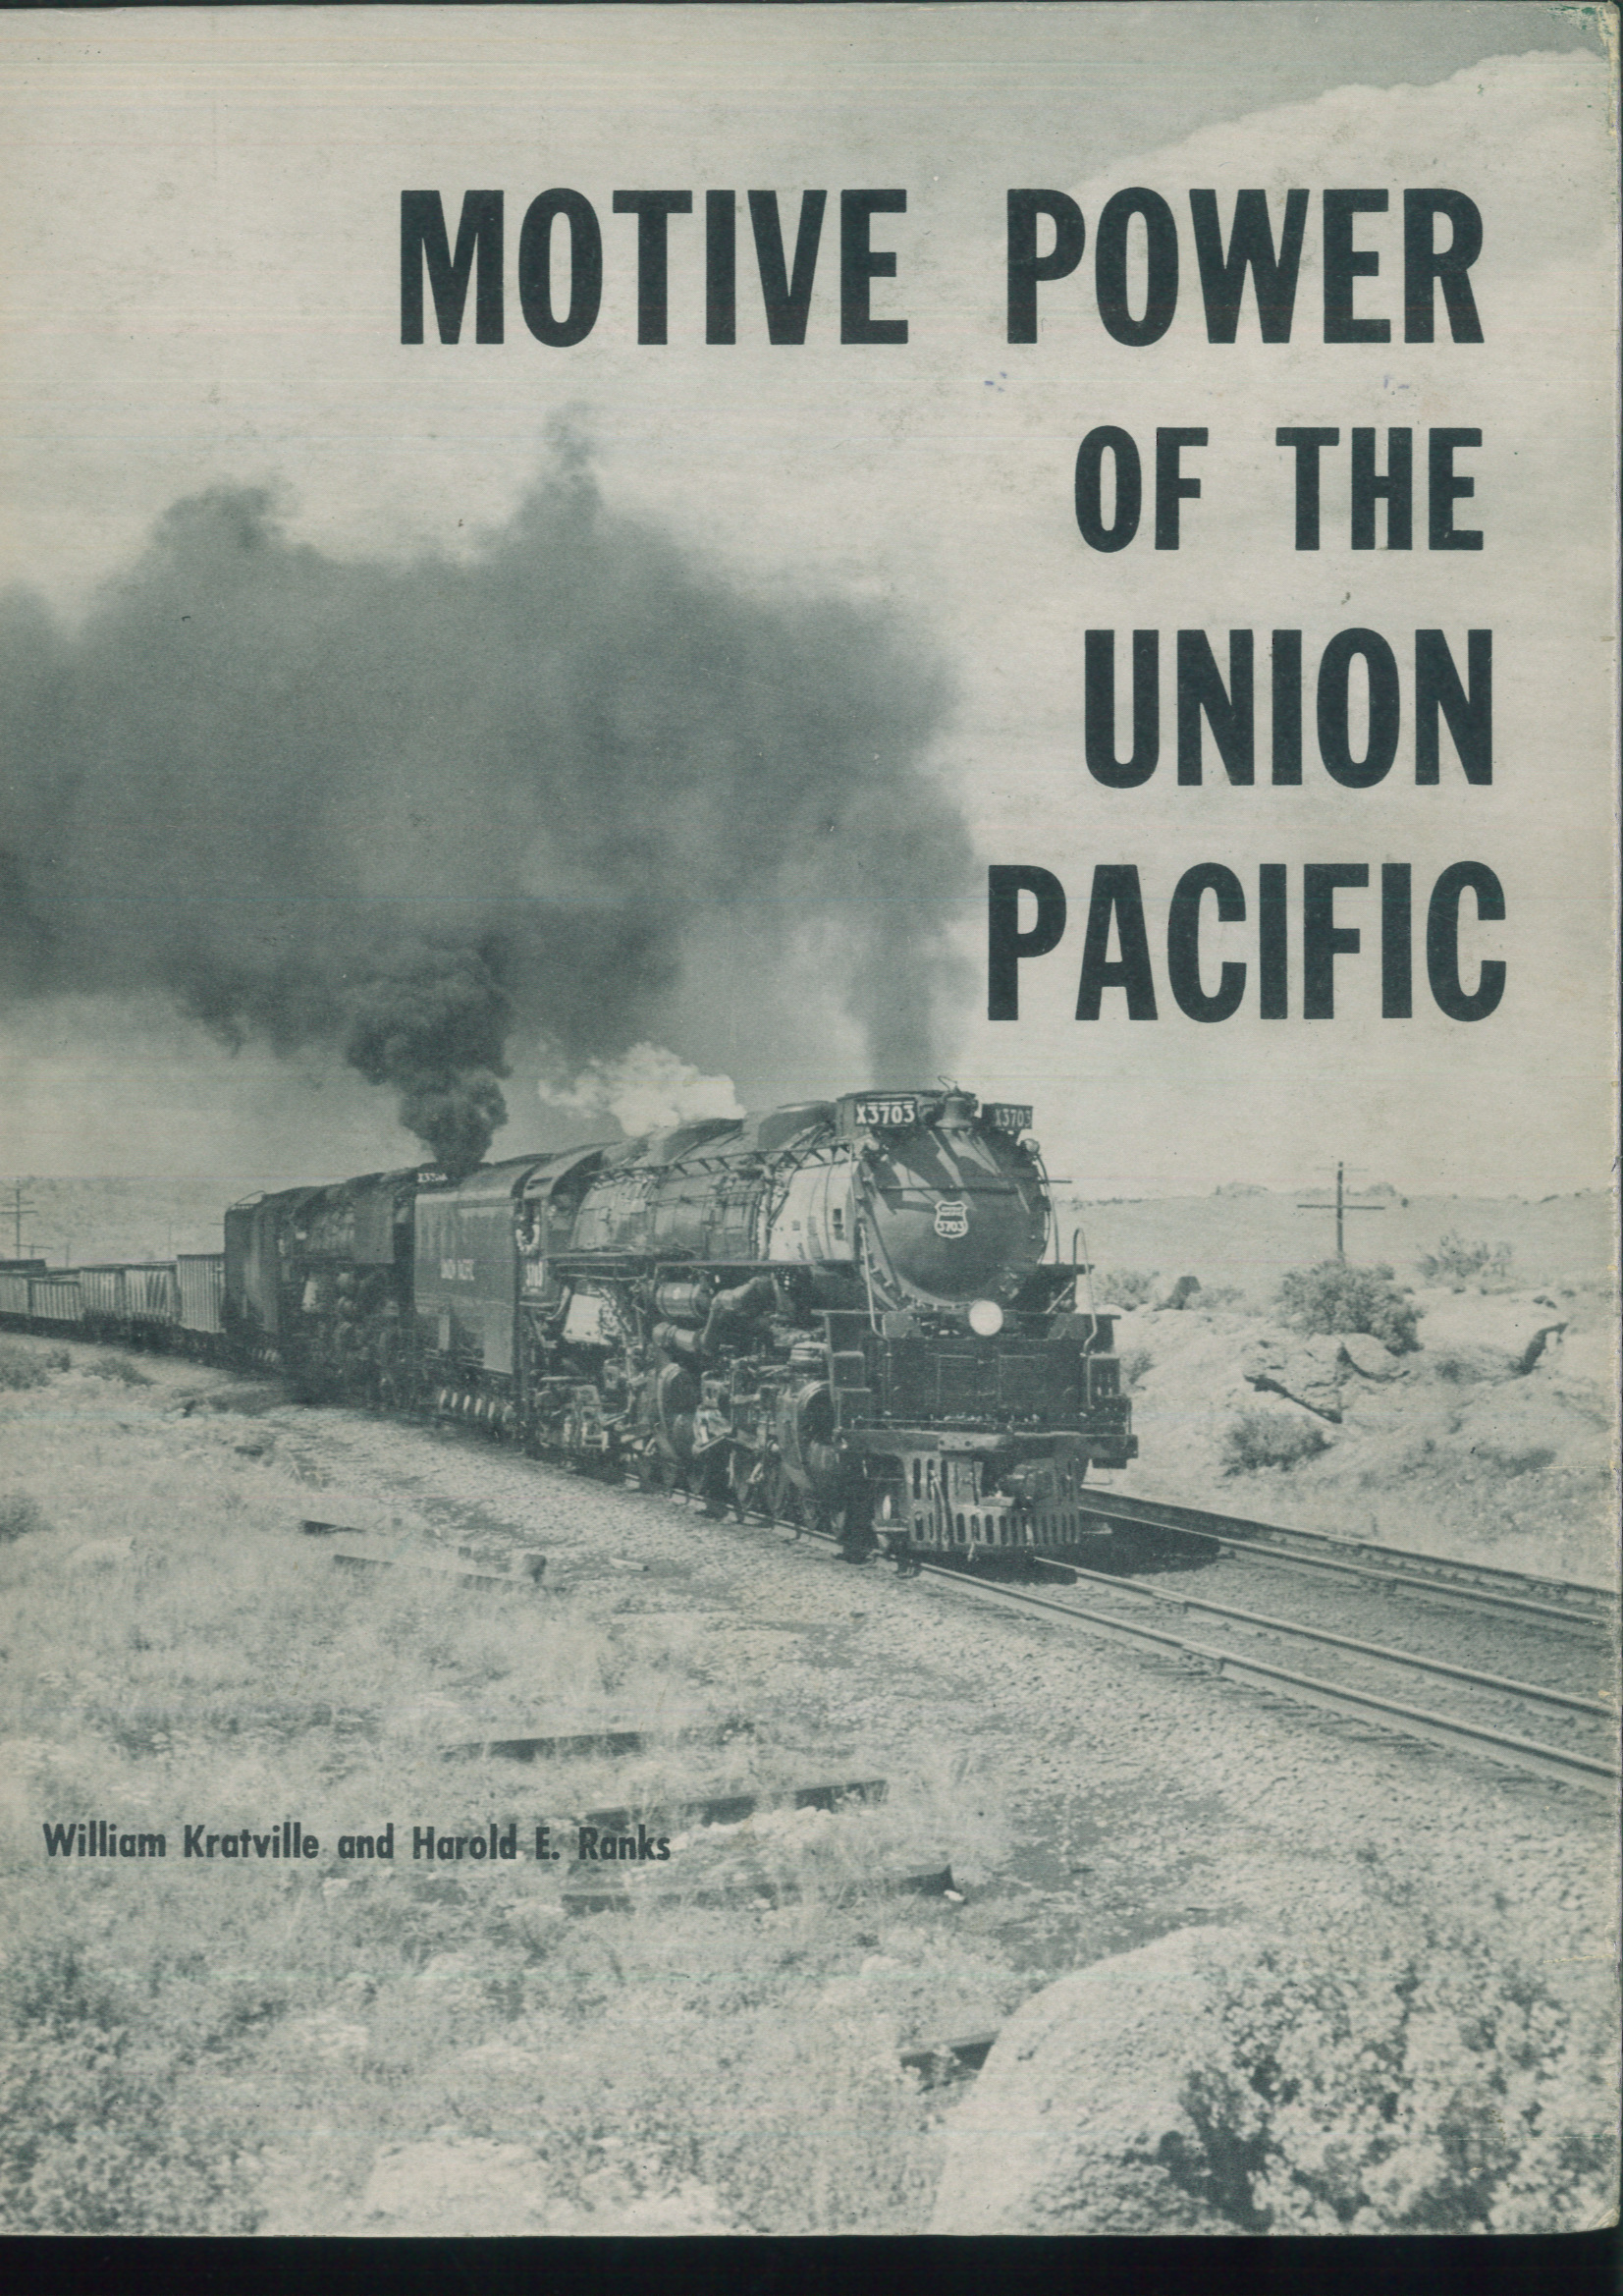 Motive Power of the Union Pacific  - William Kratville + Harold E. Ranks | günstig bestellen bei Modelleisenbahn Center  MCS Vertriebs GmbH